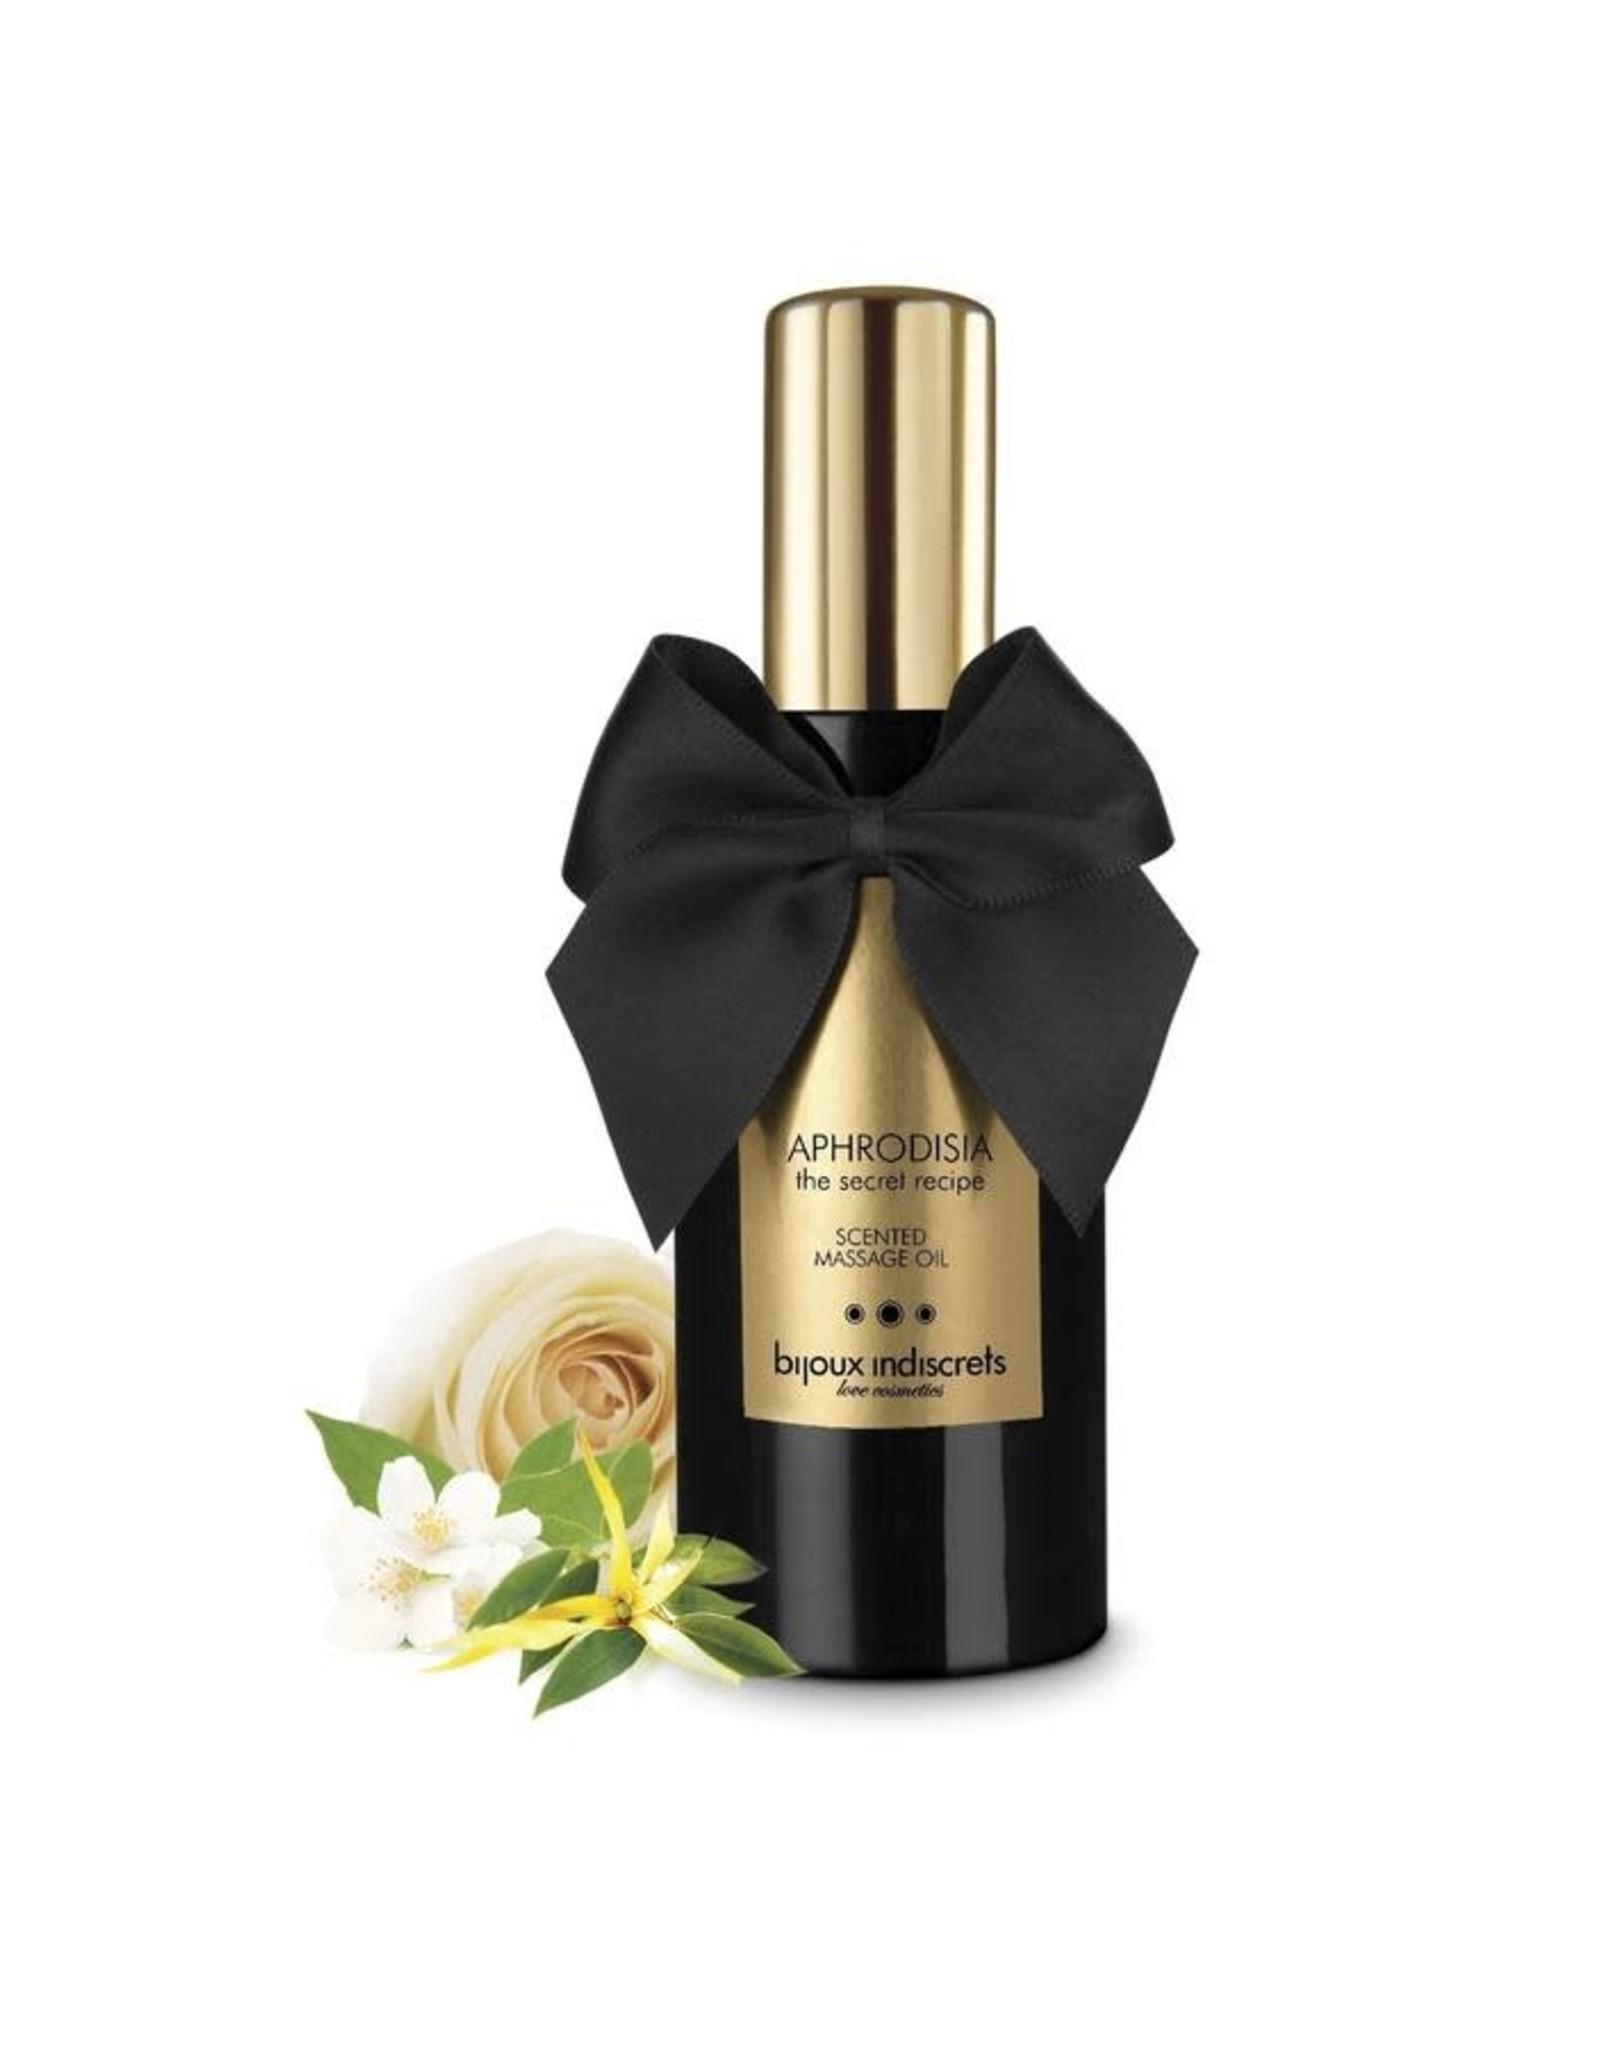 Bijoux Indiscrets Aphrodisia - Scented massage oil